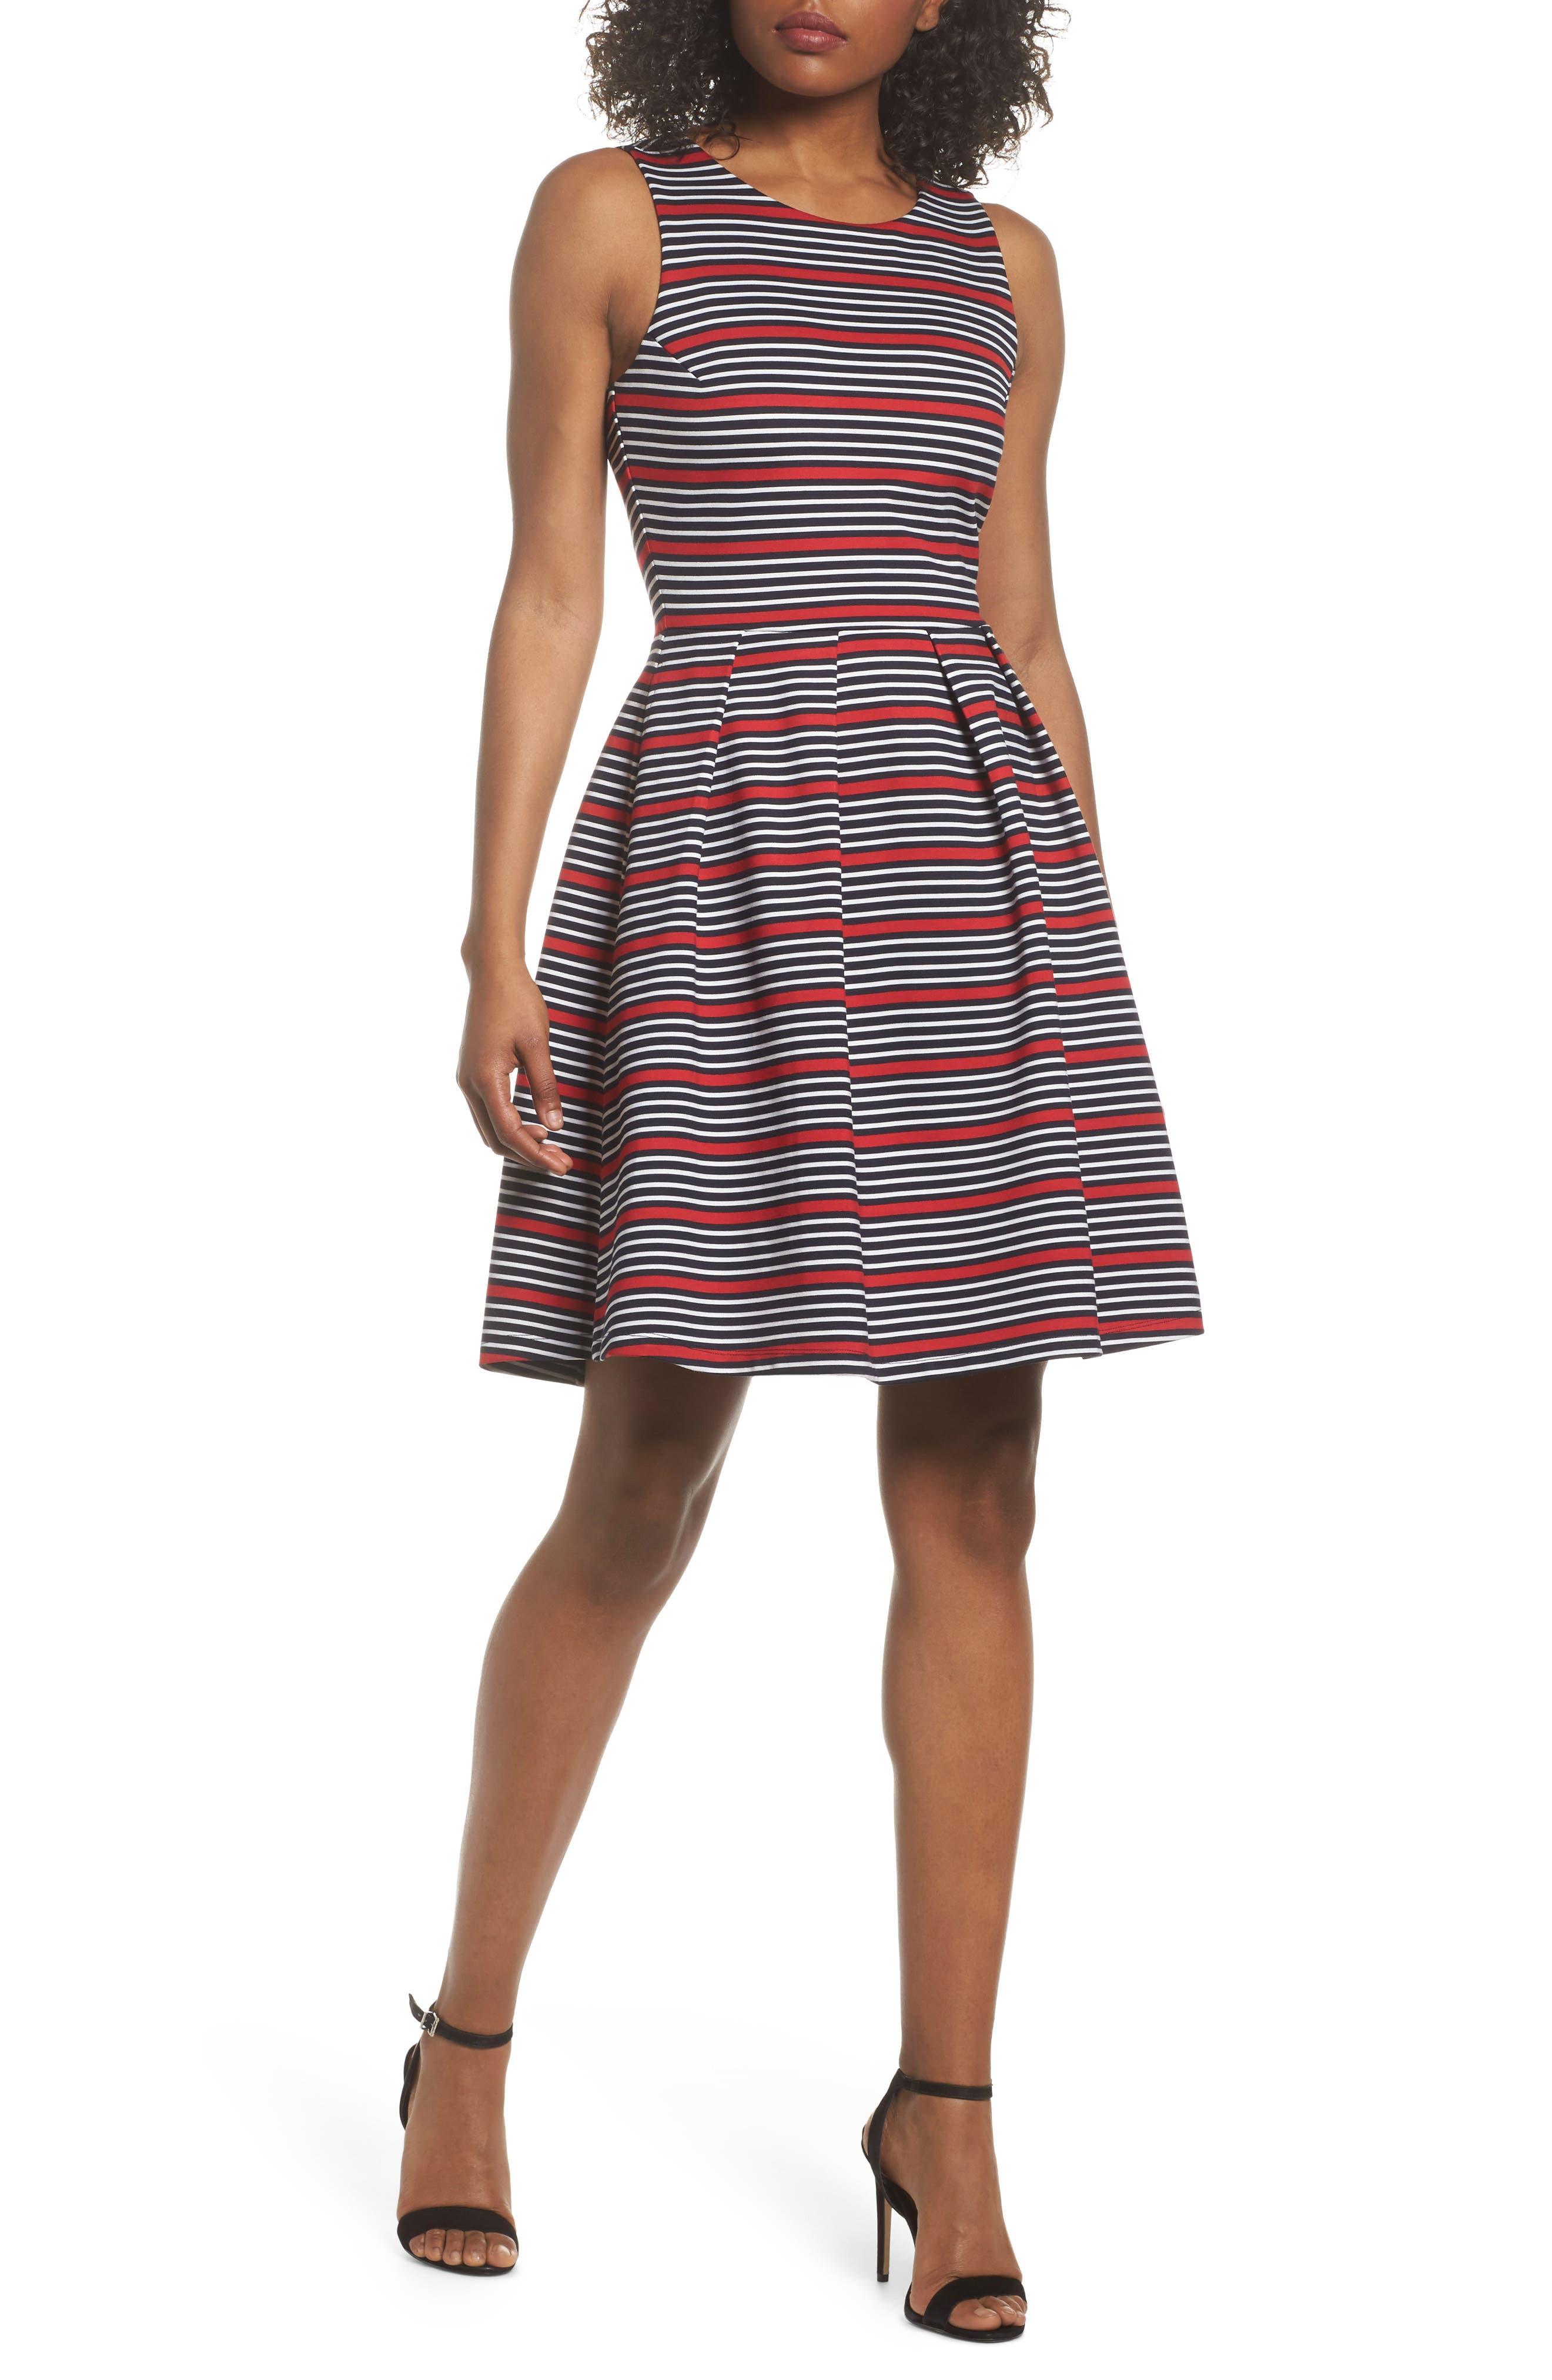 Scarlette Stripe Fit & Flare Dress,                             Main thumbnail 1, color,                             Navy/ Red/ White Stripe